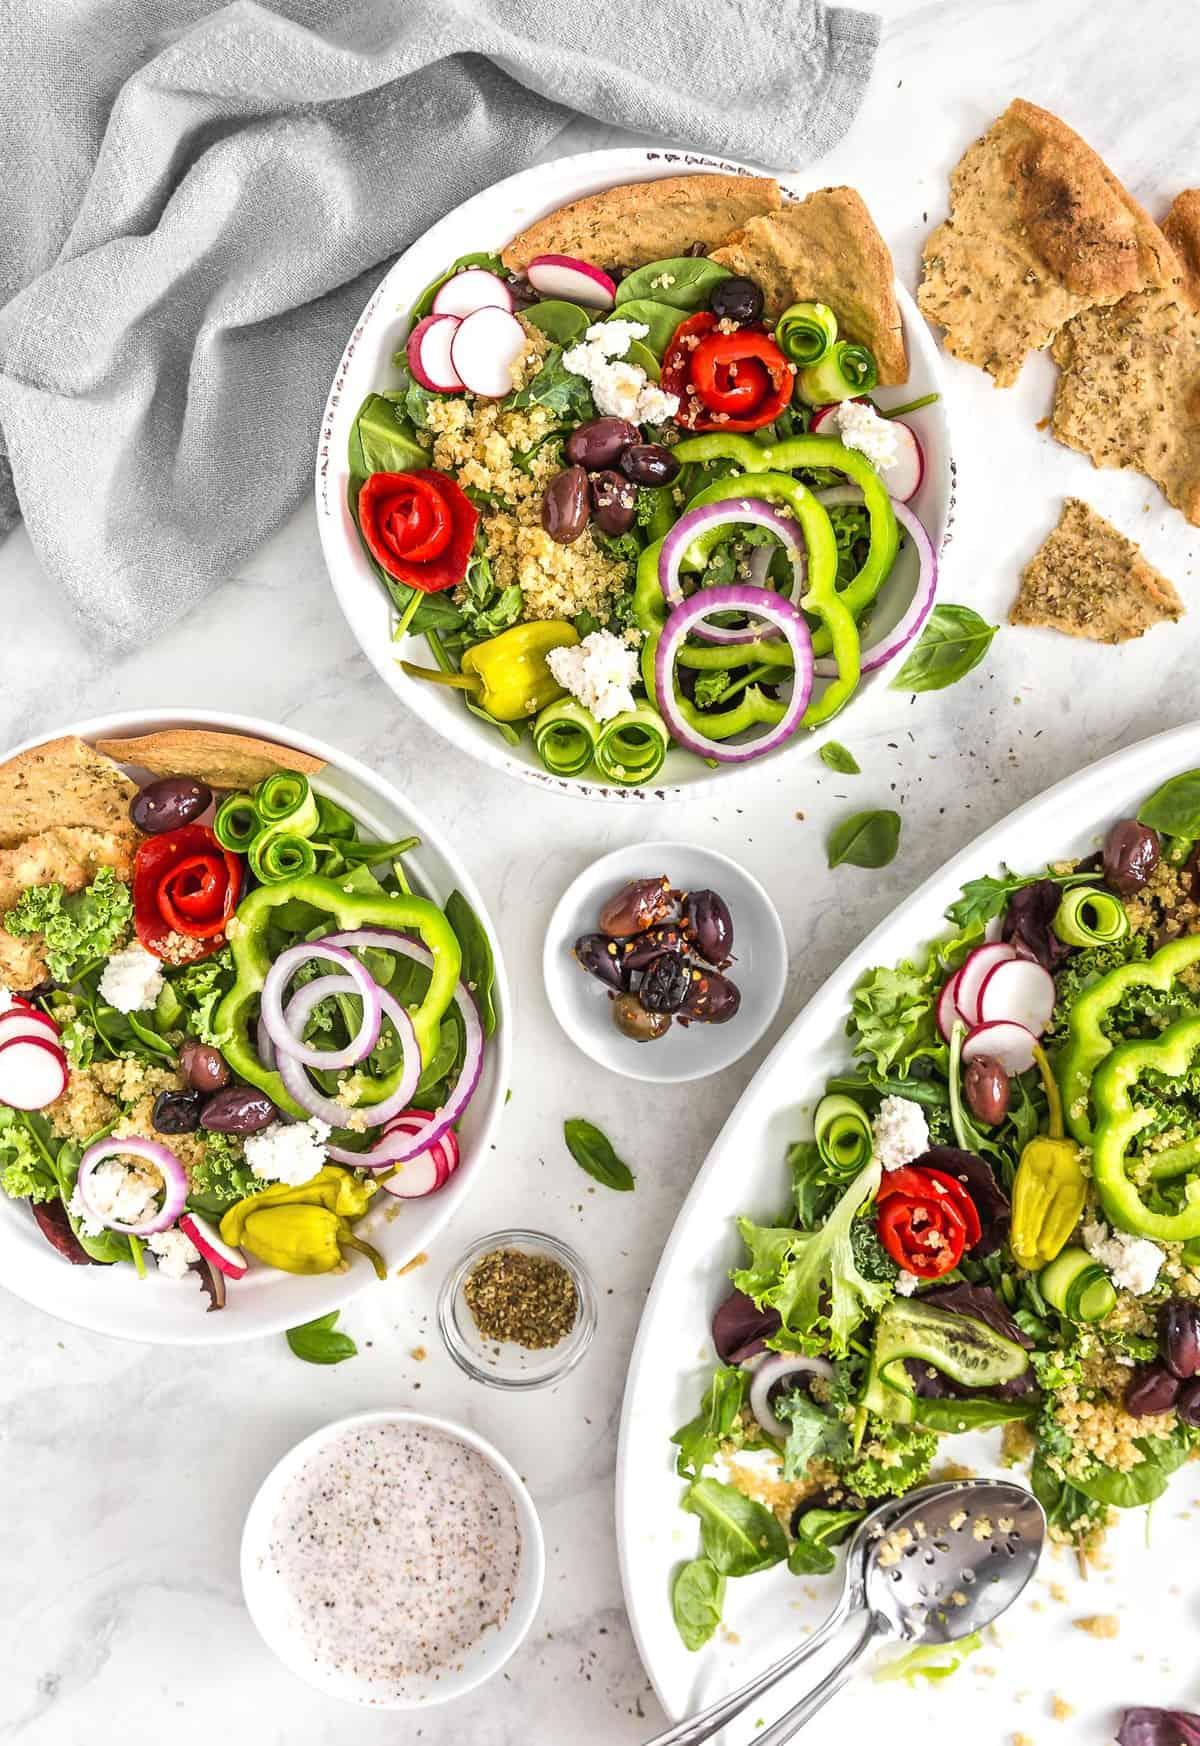 No Oil Greek Salad, Vegan salad, Greek salad, veggies, salad, plant based salad, plant based, vegan, vegetarian, whole food plant based, gluten free, recipe, wfpb, healthy, healthy vegan, oil free, no refined sugar, no oil, refined sugar free, dairy free, dairy, dinner, lunch, healthy recipe, Greek recipe, simple recipes